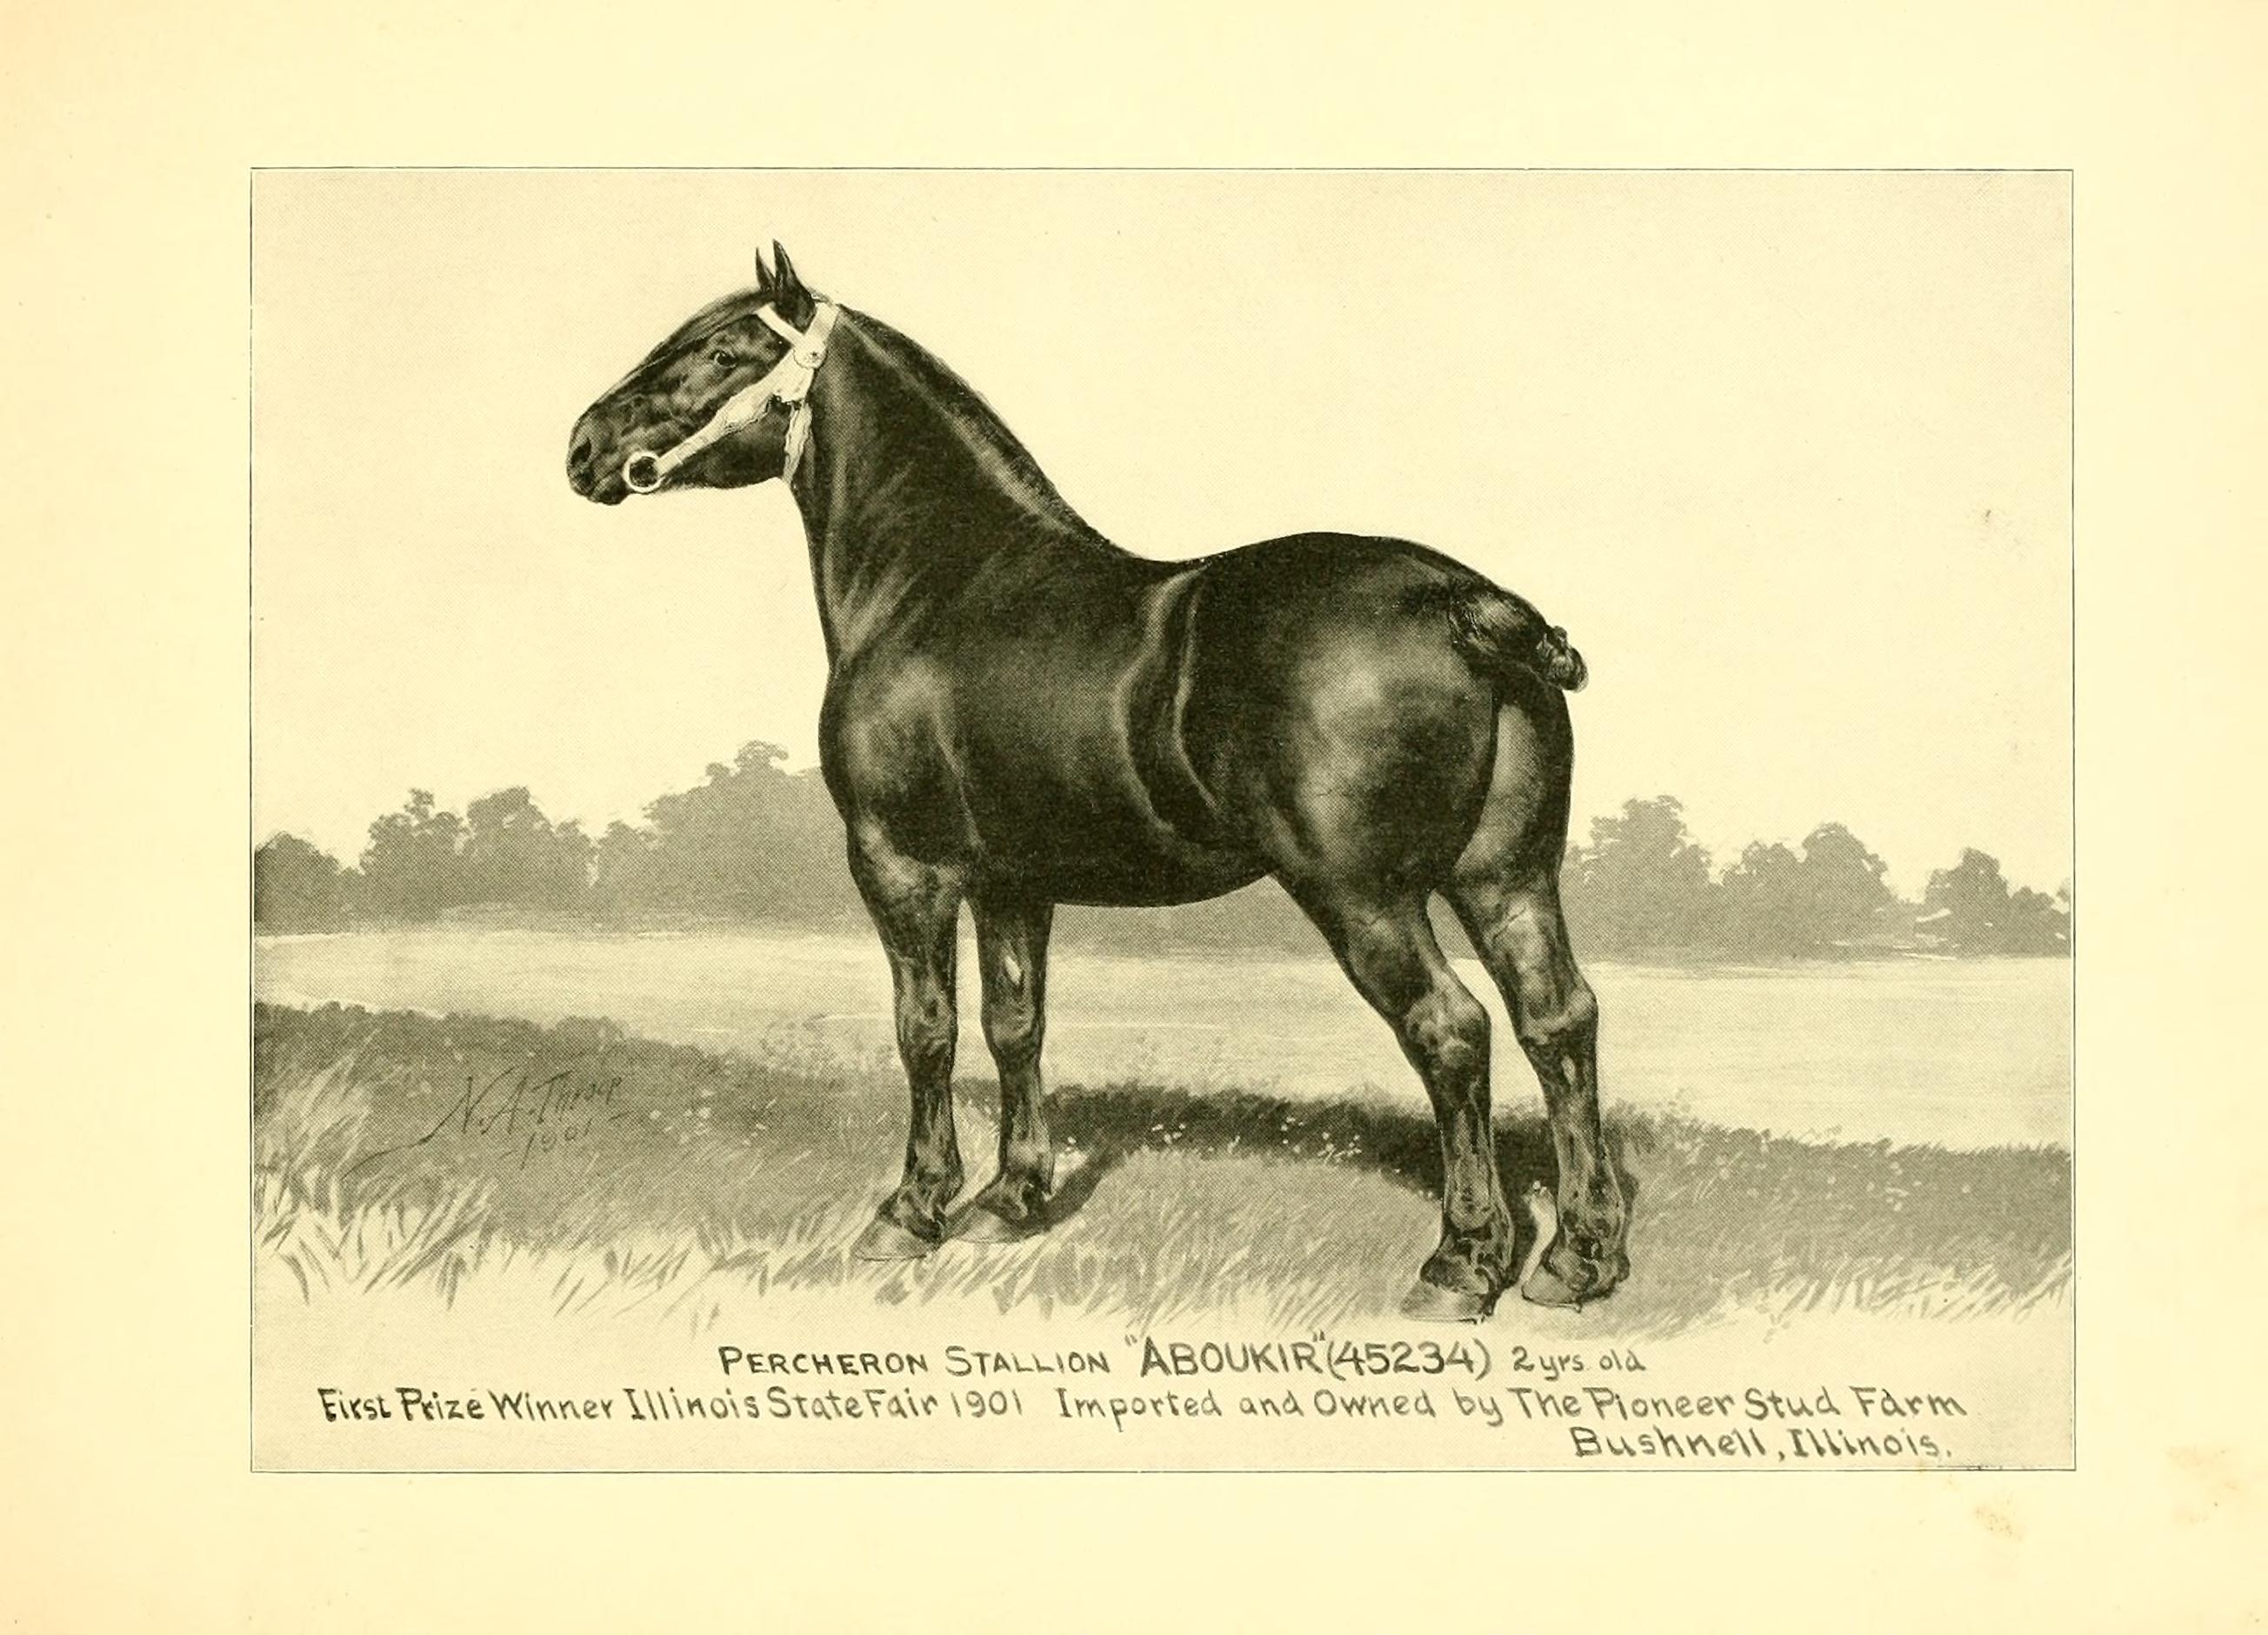 File:Catalogue of Truman's Pioneer Stud Farm - importers, exporters